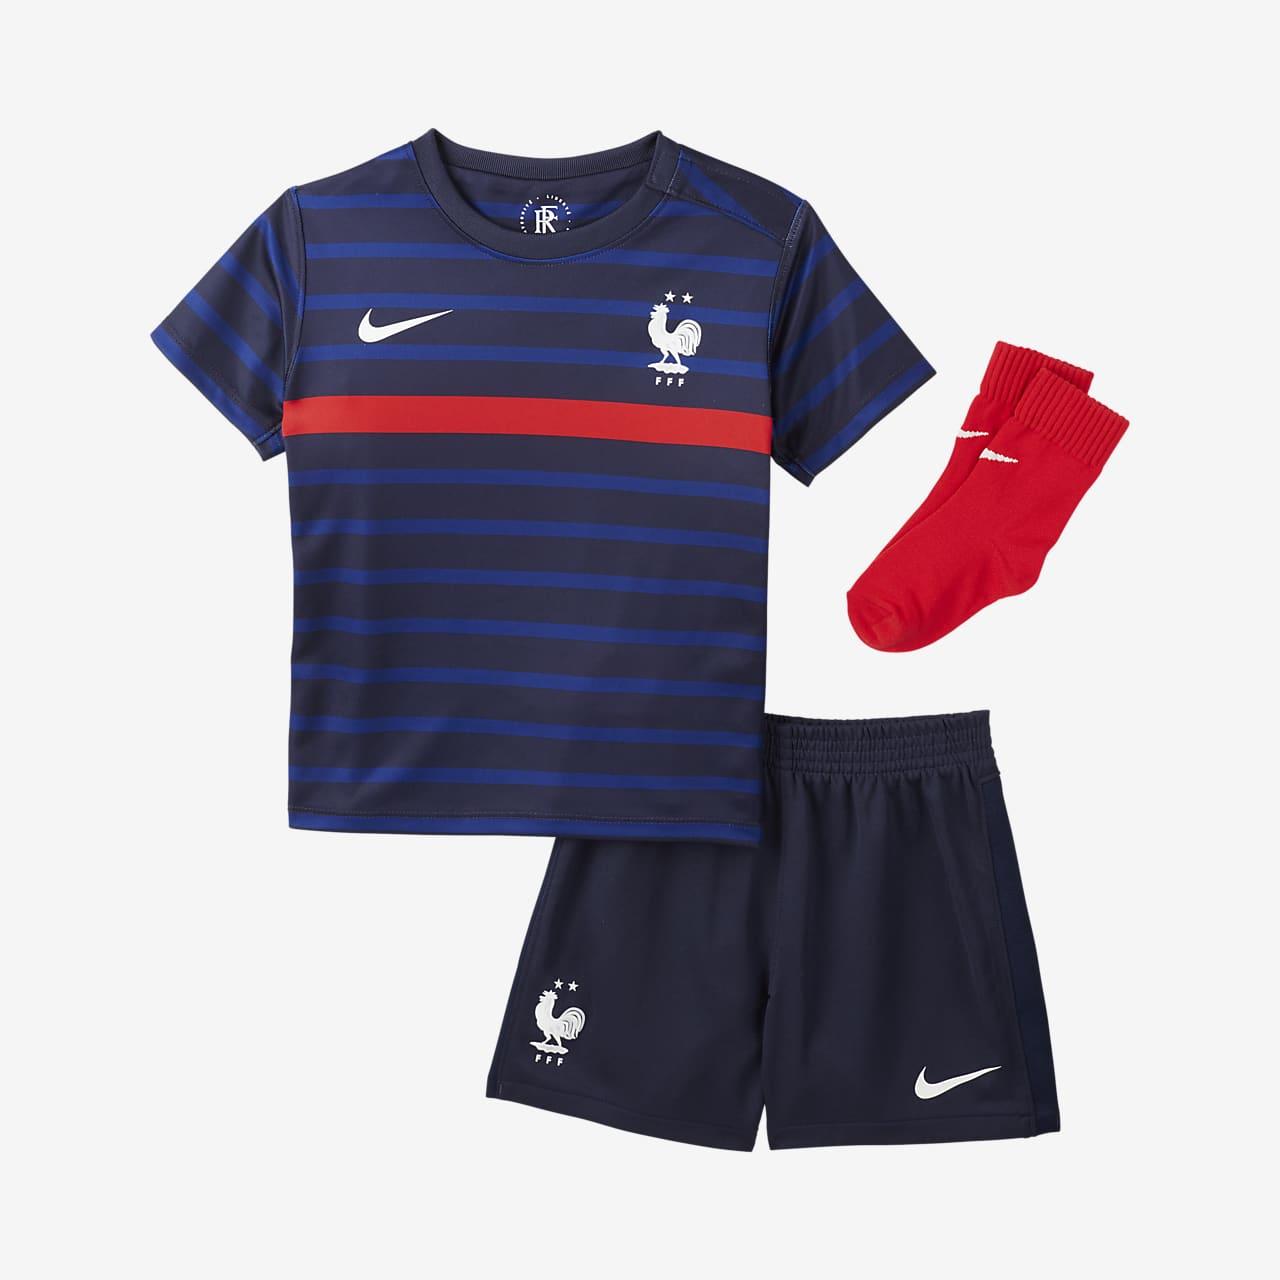 FFF 2020 hazai futballszett babáknak